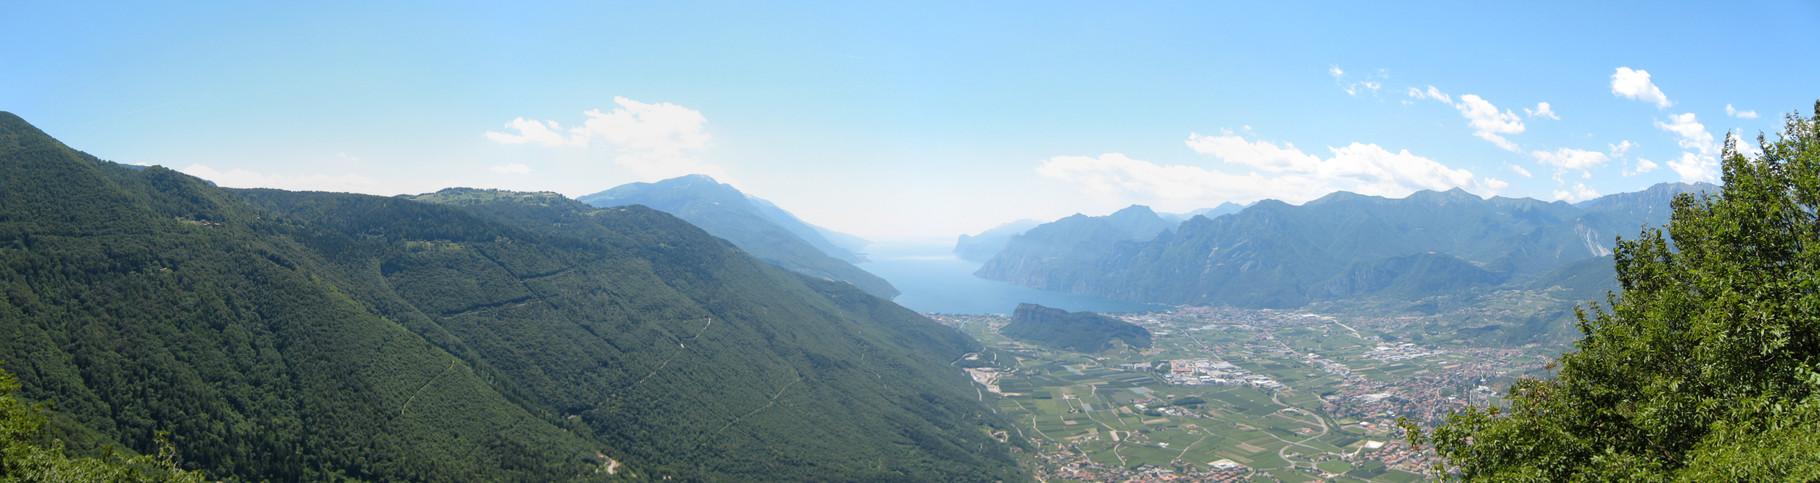 Panorama über den Lago die Garda